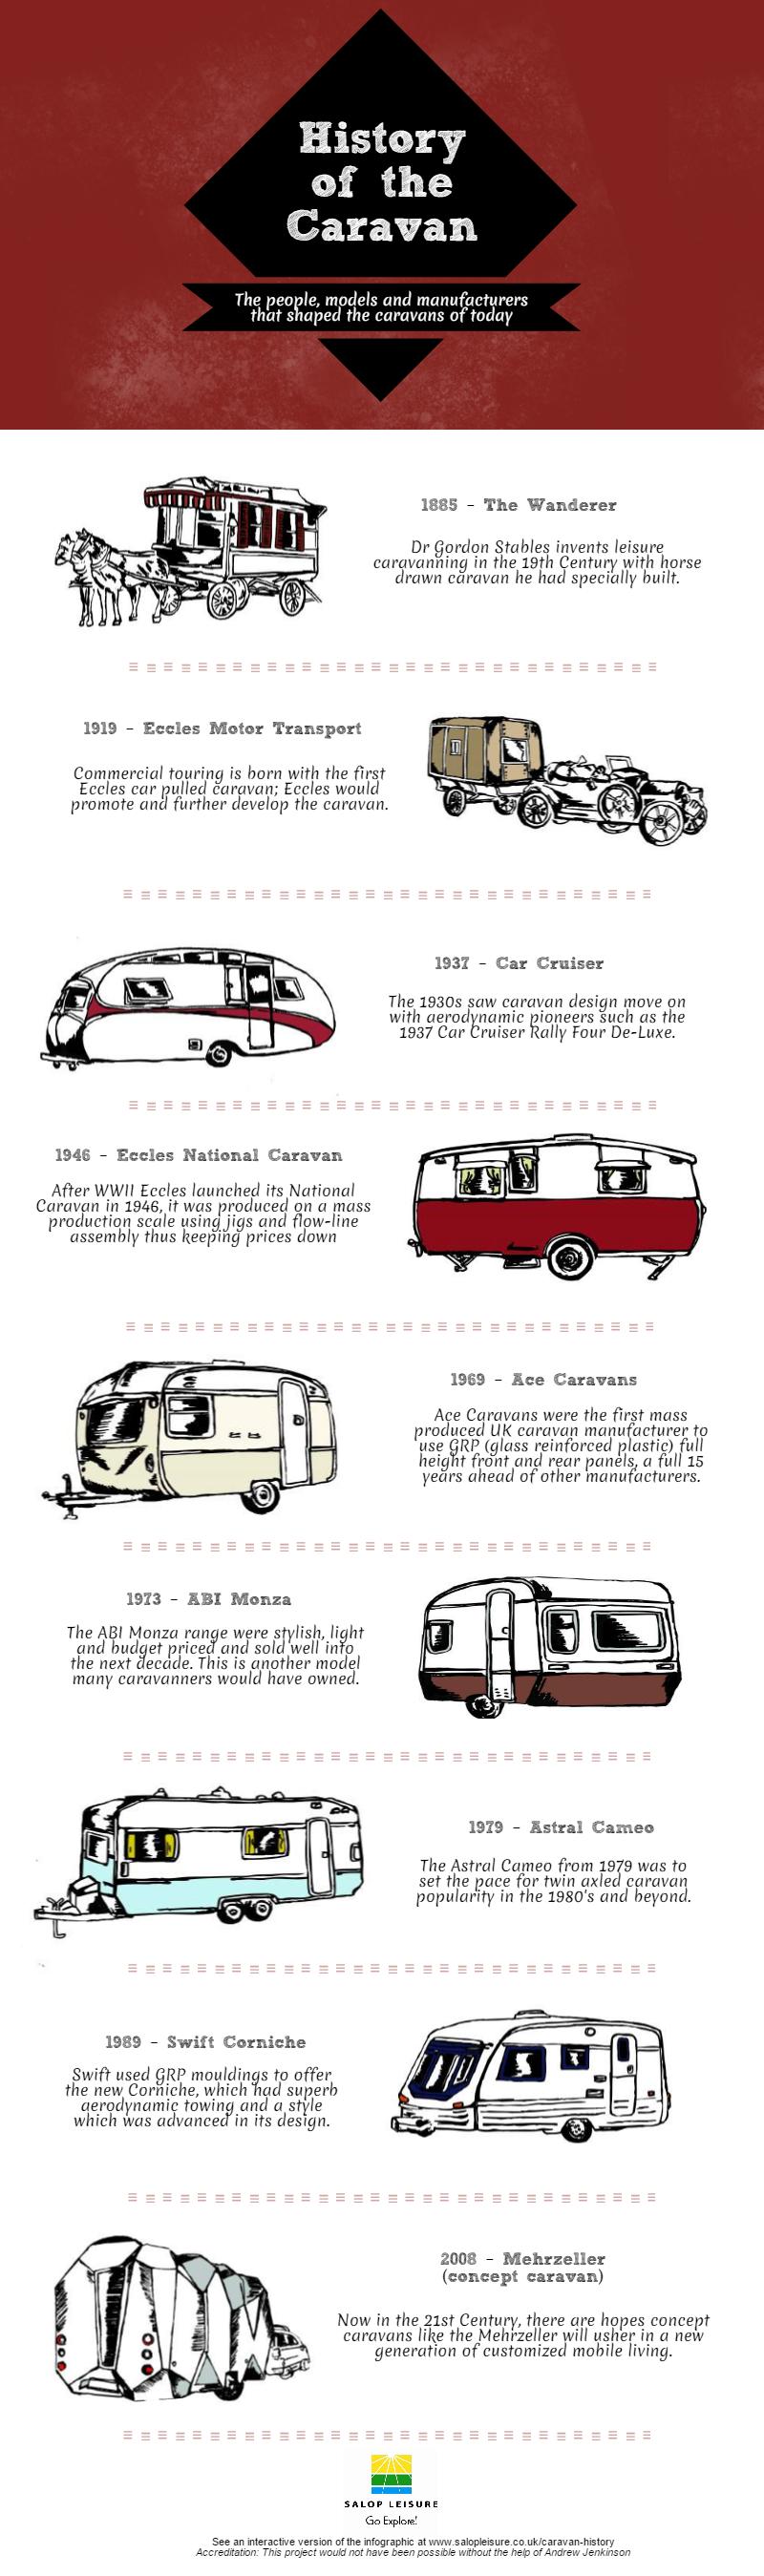 Infographic-caravan-history